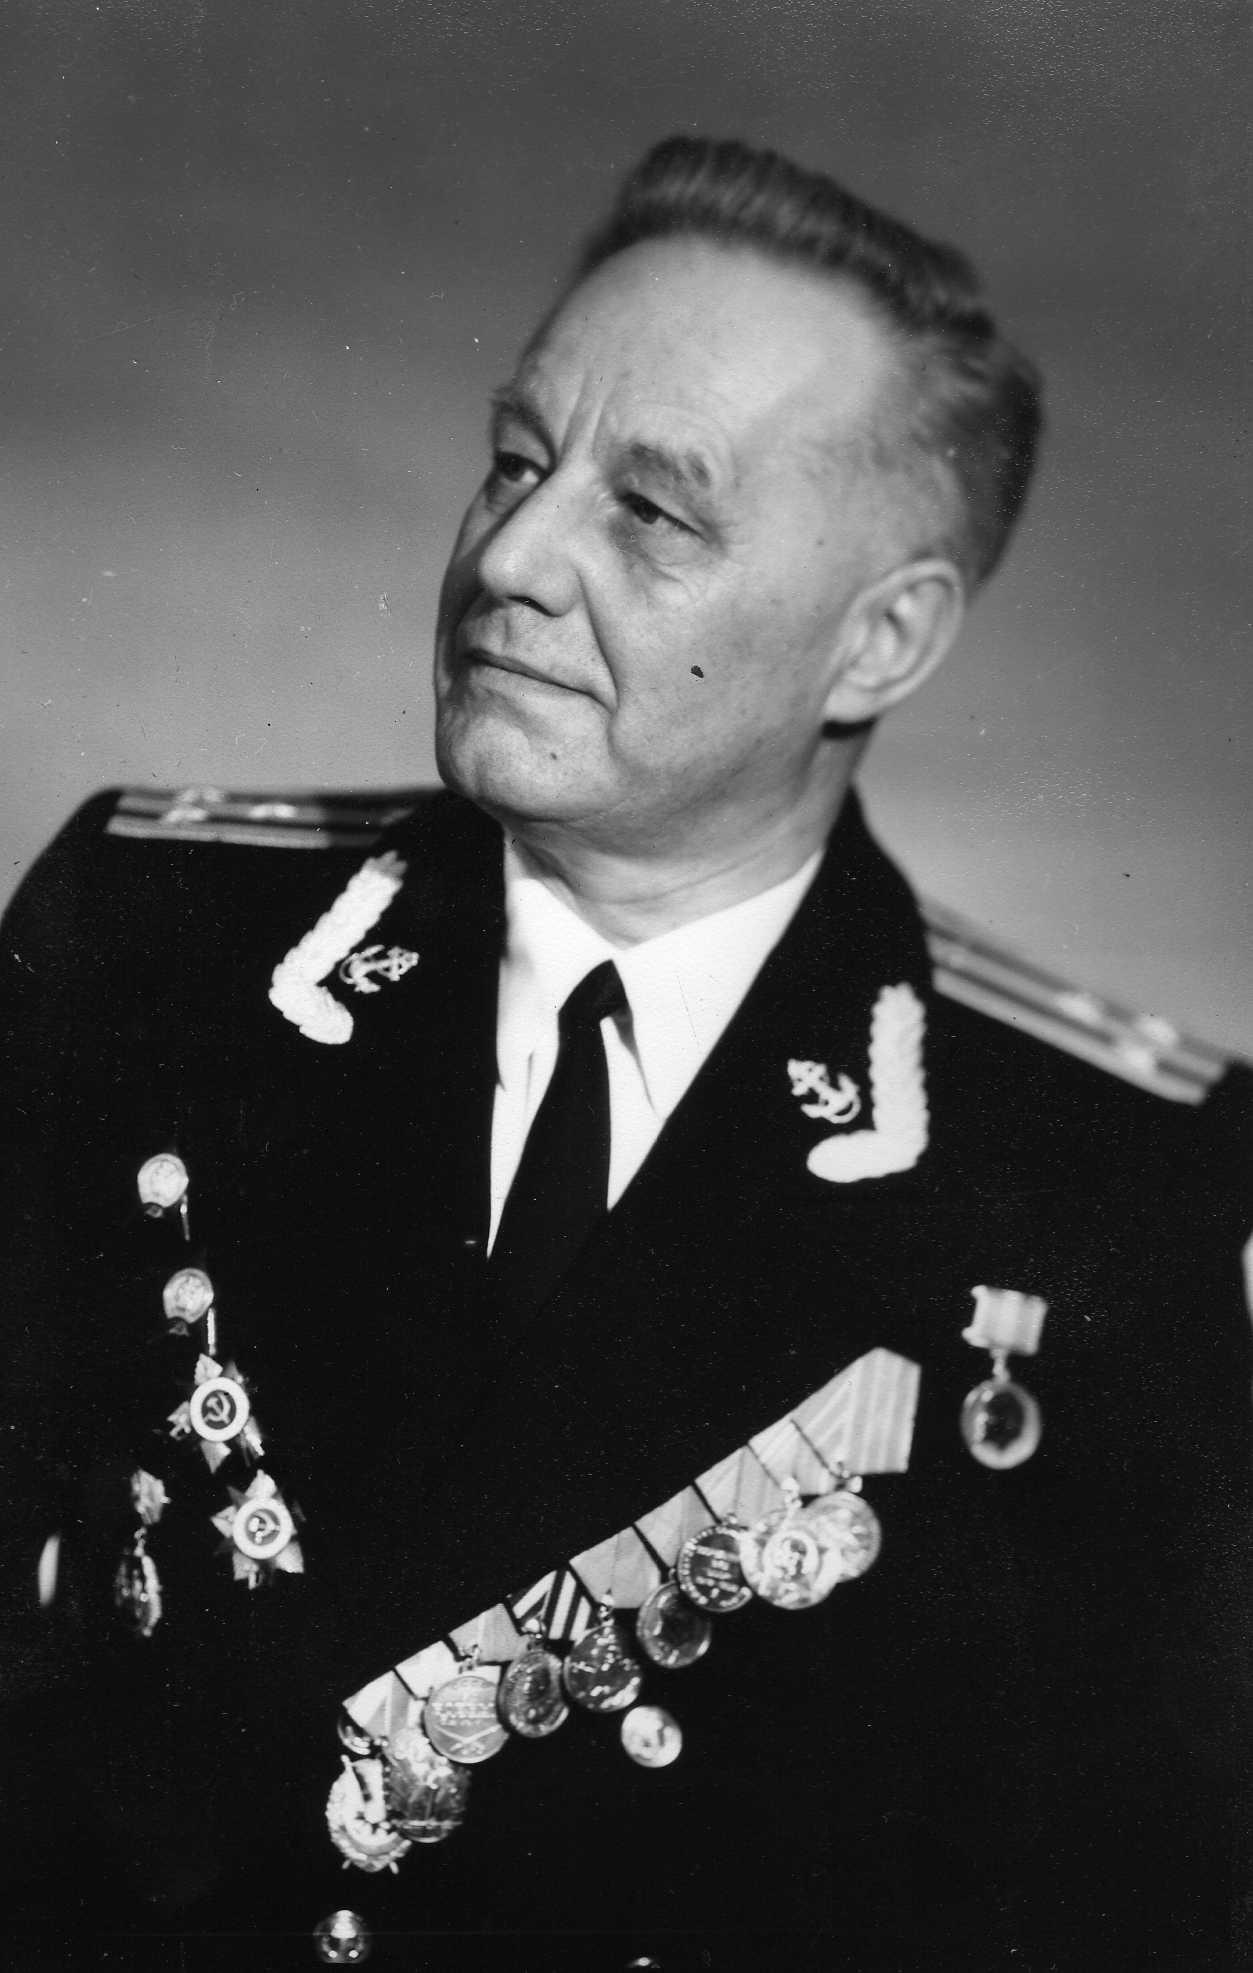 Макаревич Анатолий Алексеевич